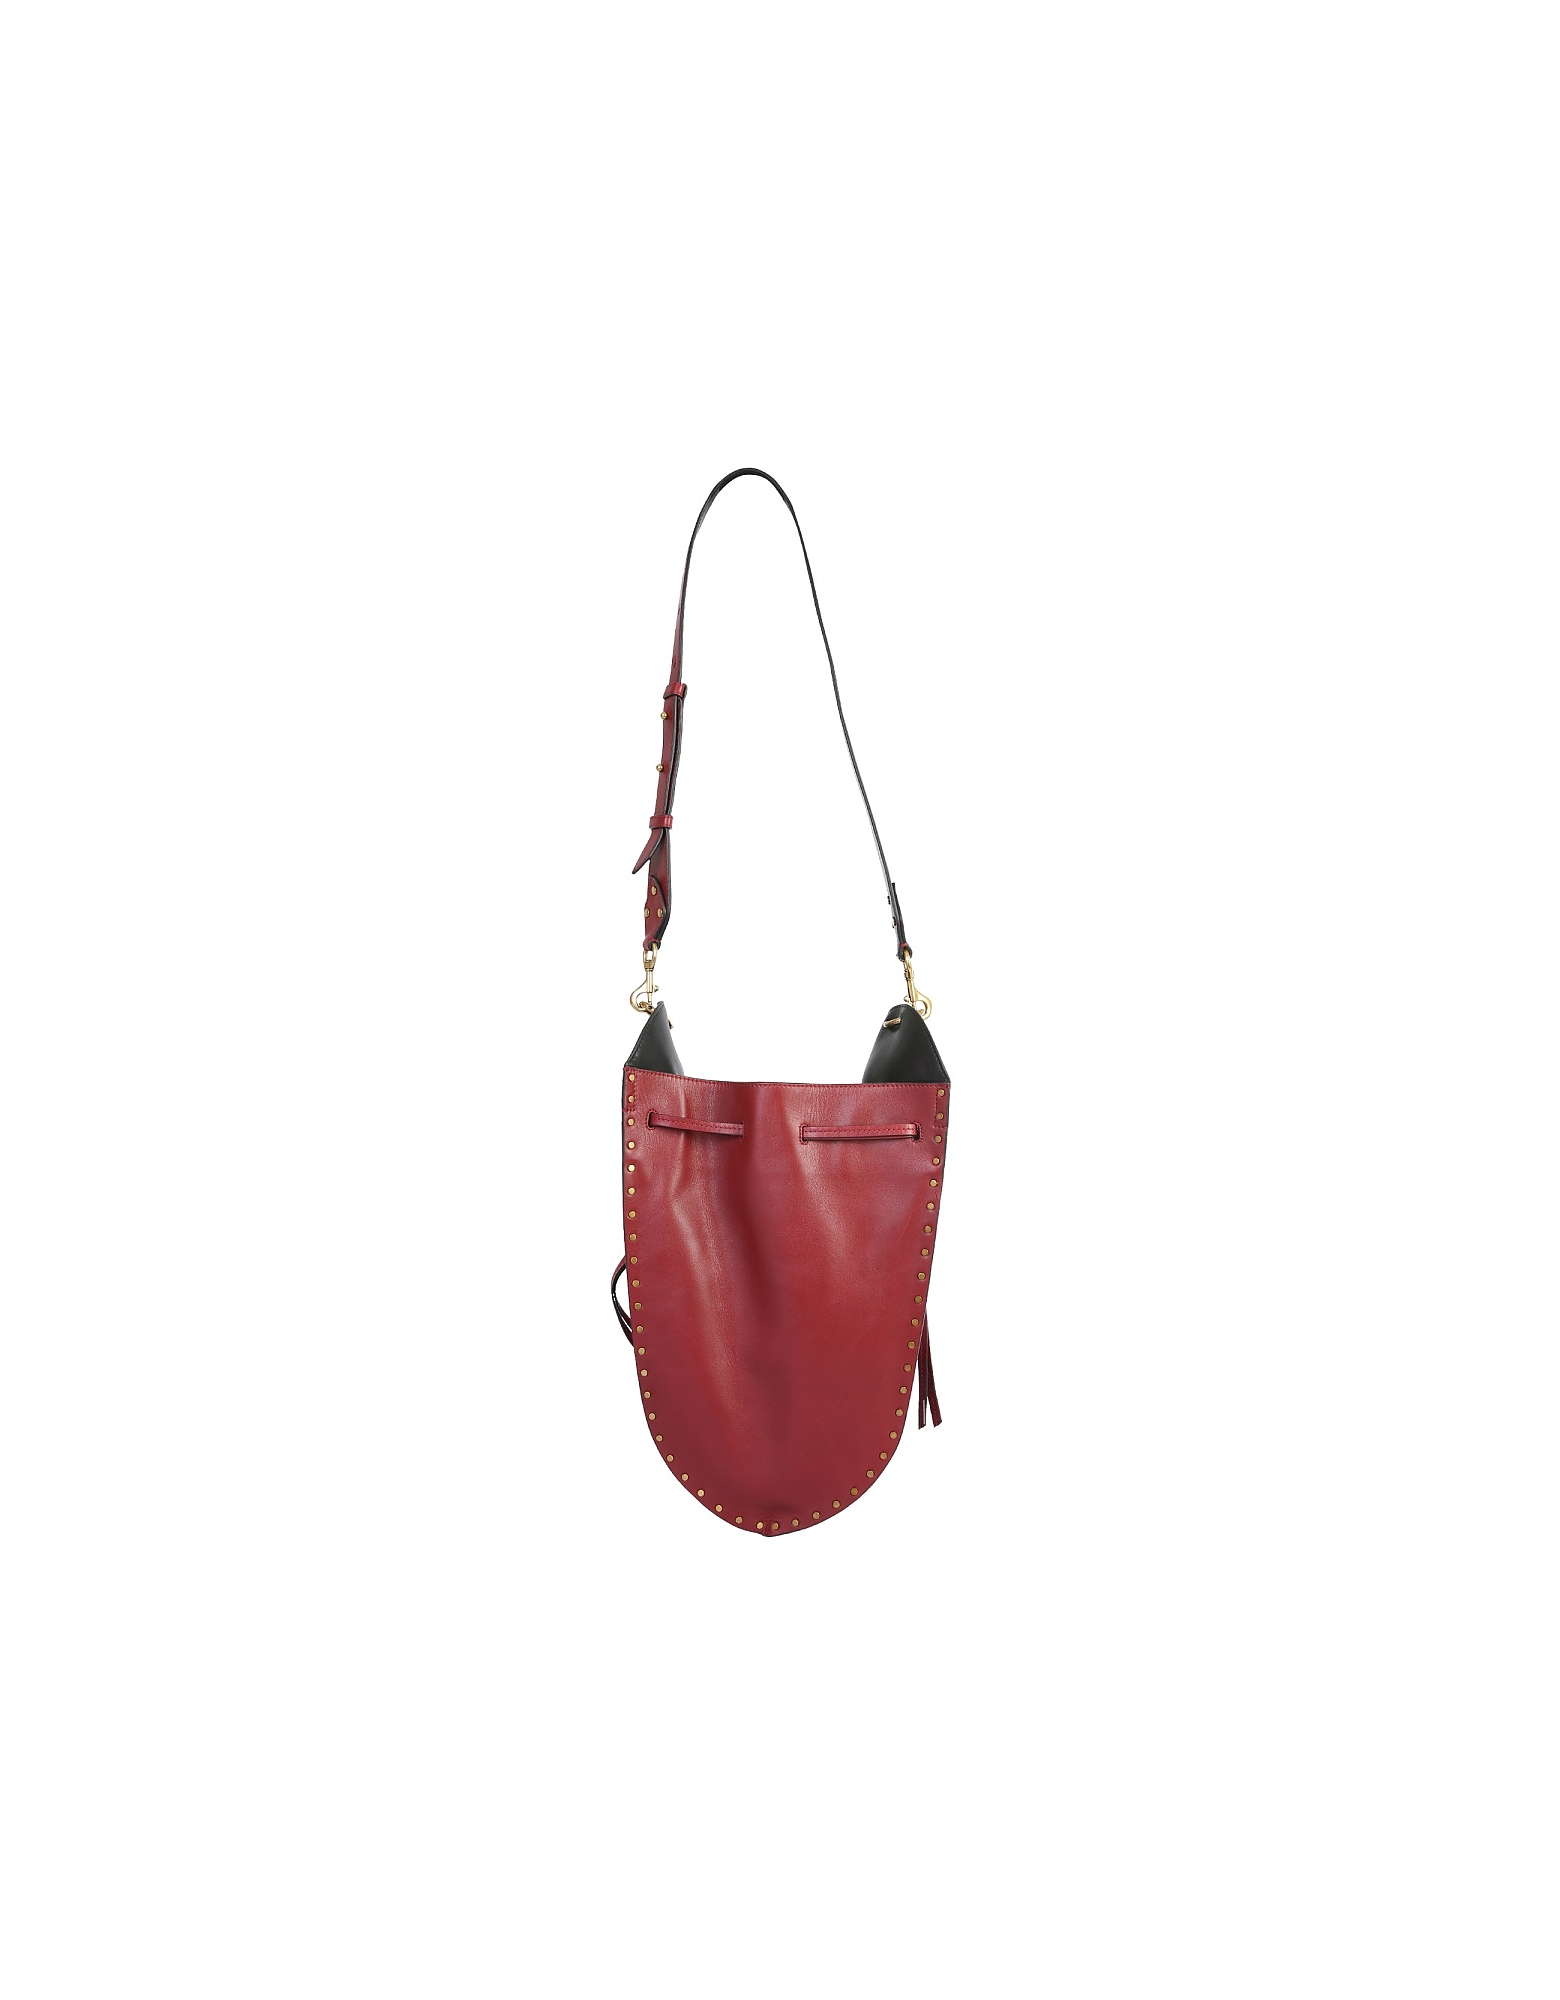 Isabel Marant Designer Handbags, Taj Shoulder Bag